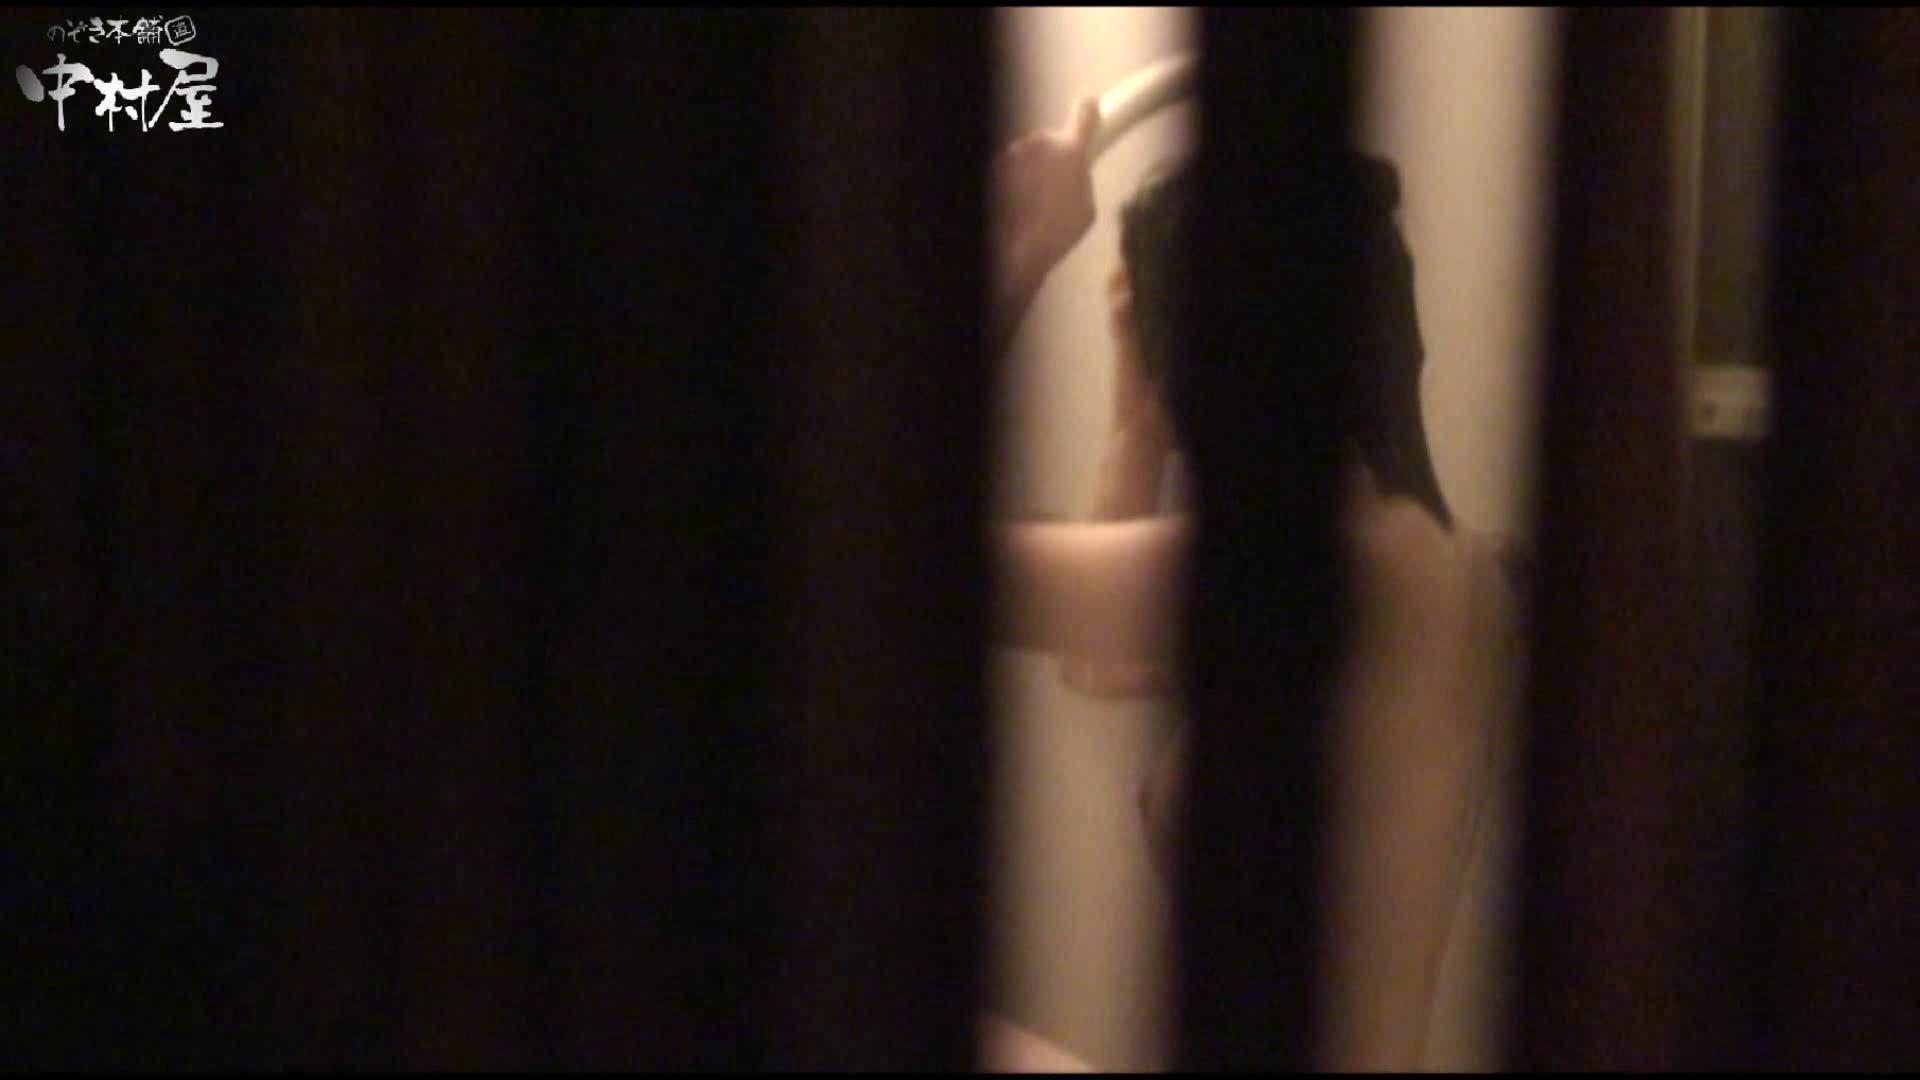 民家風呂専門盗撮師の超危険映像 vol.028 OLハメ撮り  28Pix 1